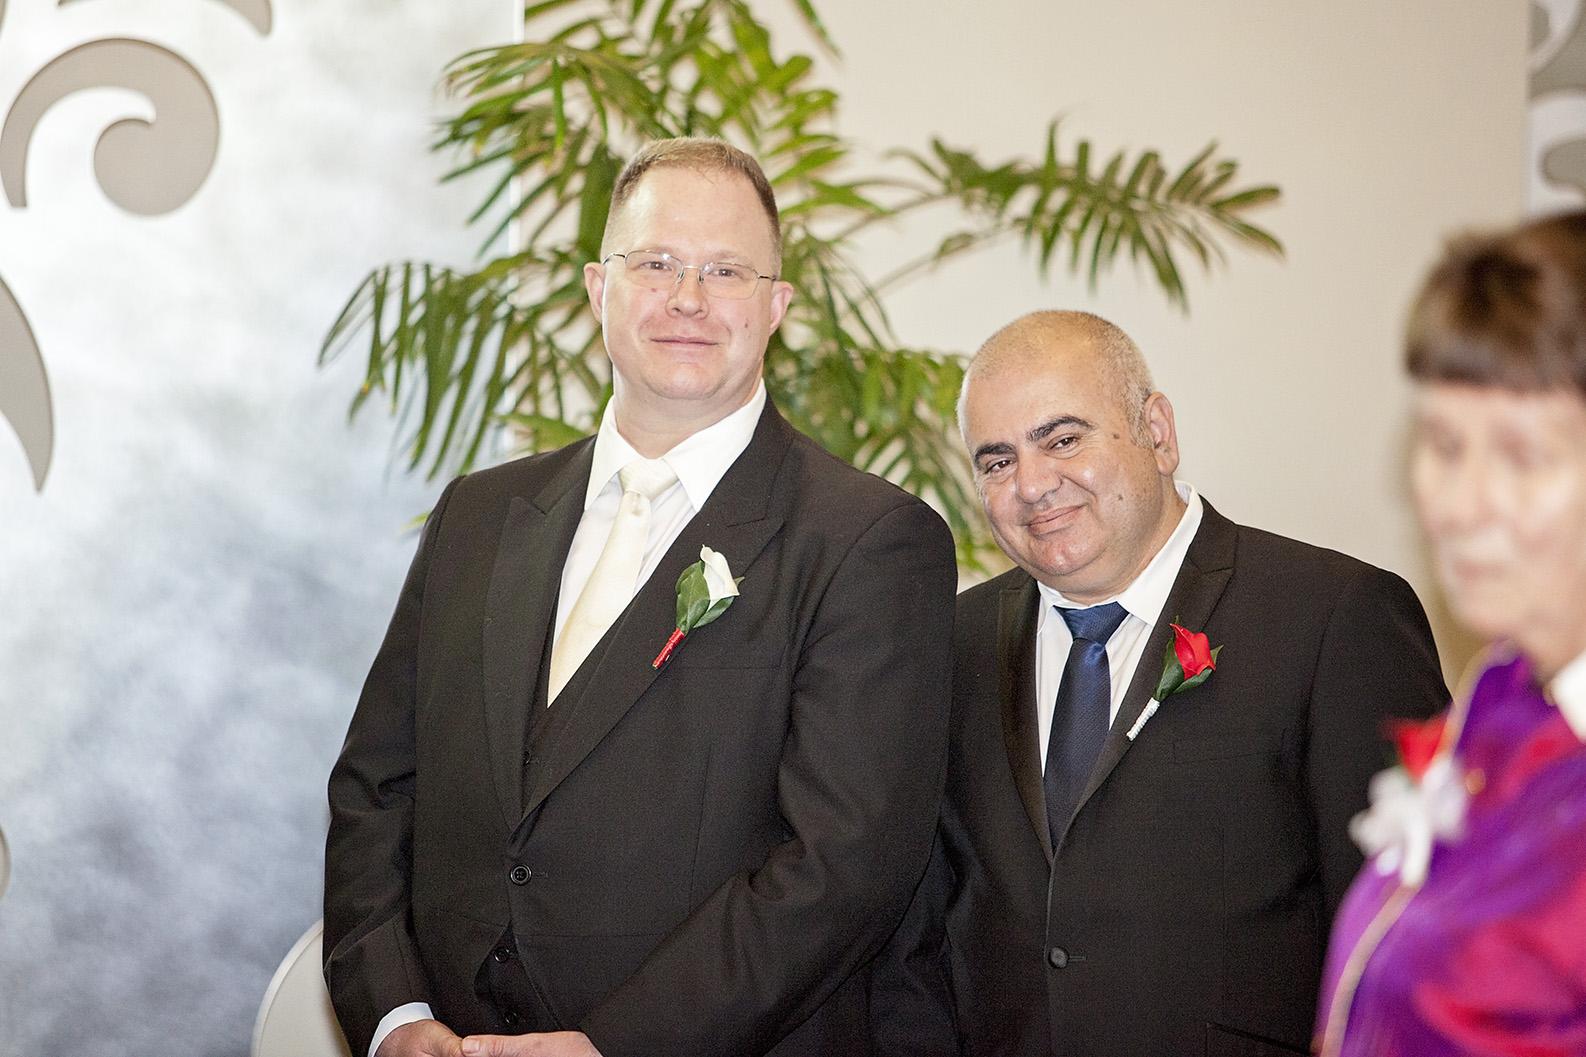 Sferas Modbury wedding 07.jpg